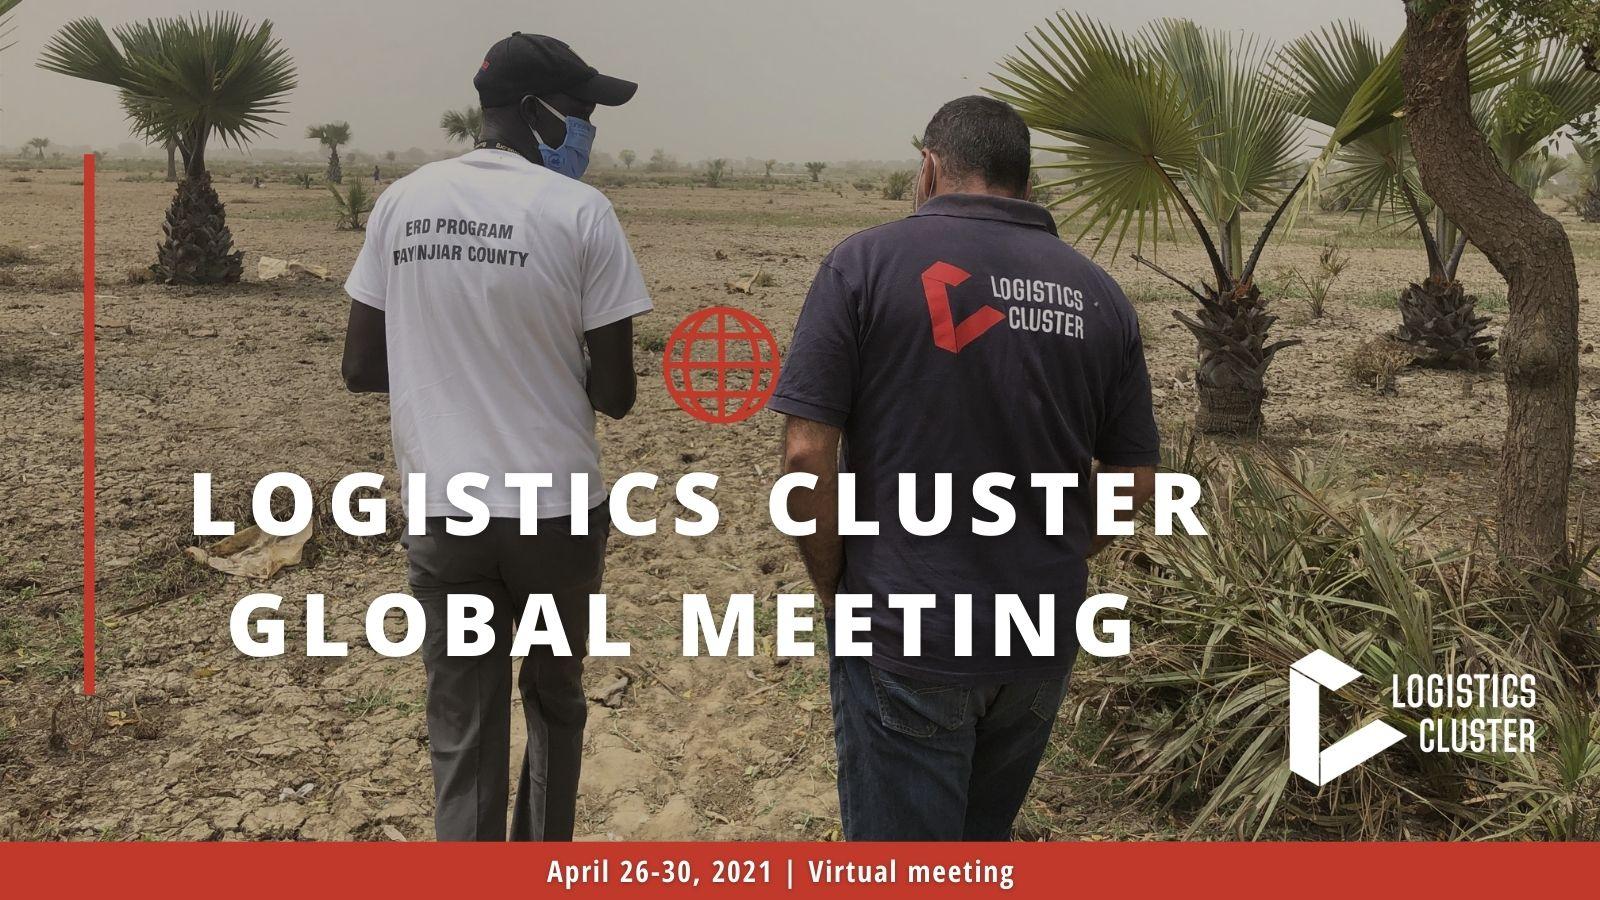 Logistics Cluster Global Meeting print